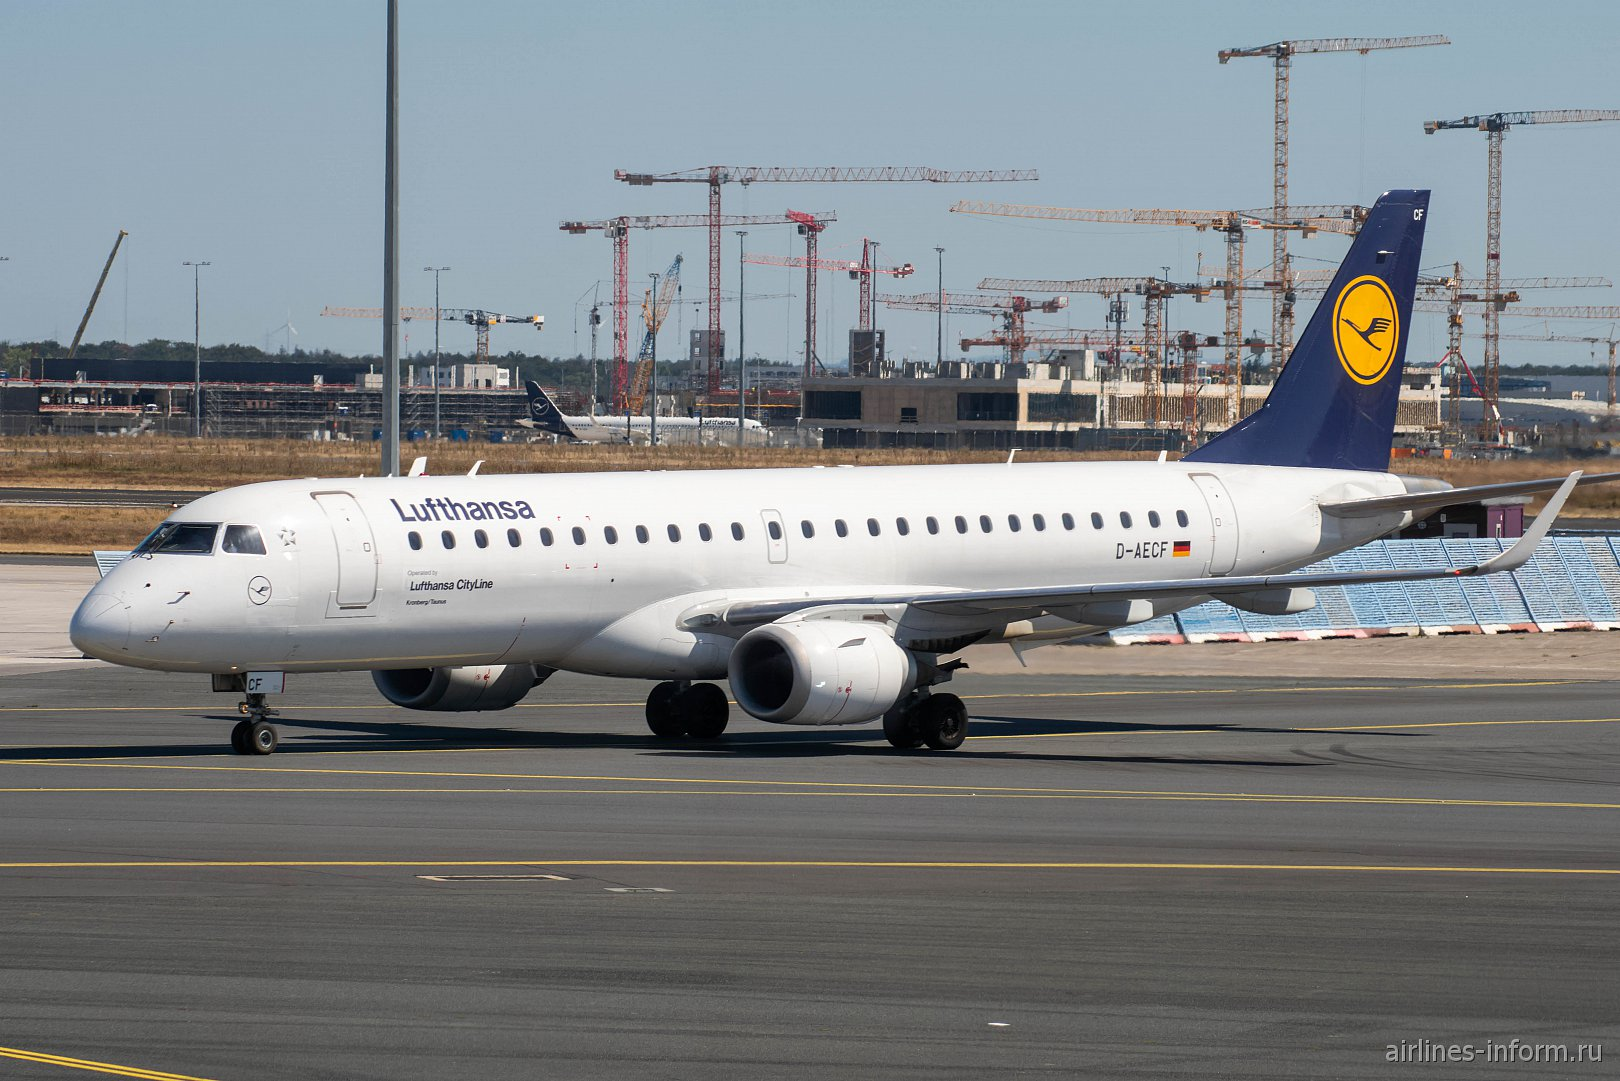 Авиалайнер Embraer 190 D-AECF авиакомпании Lufthansa CityLine в аэропорту Франкфурт